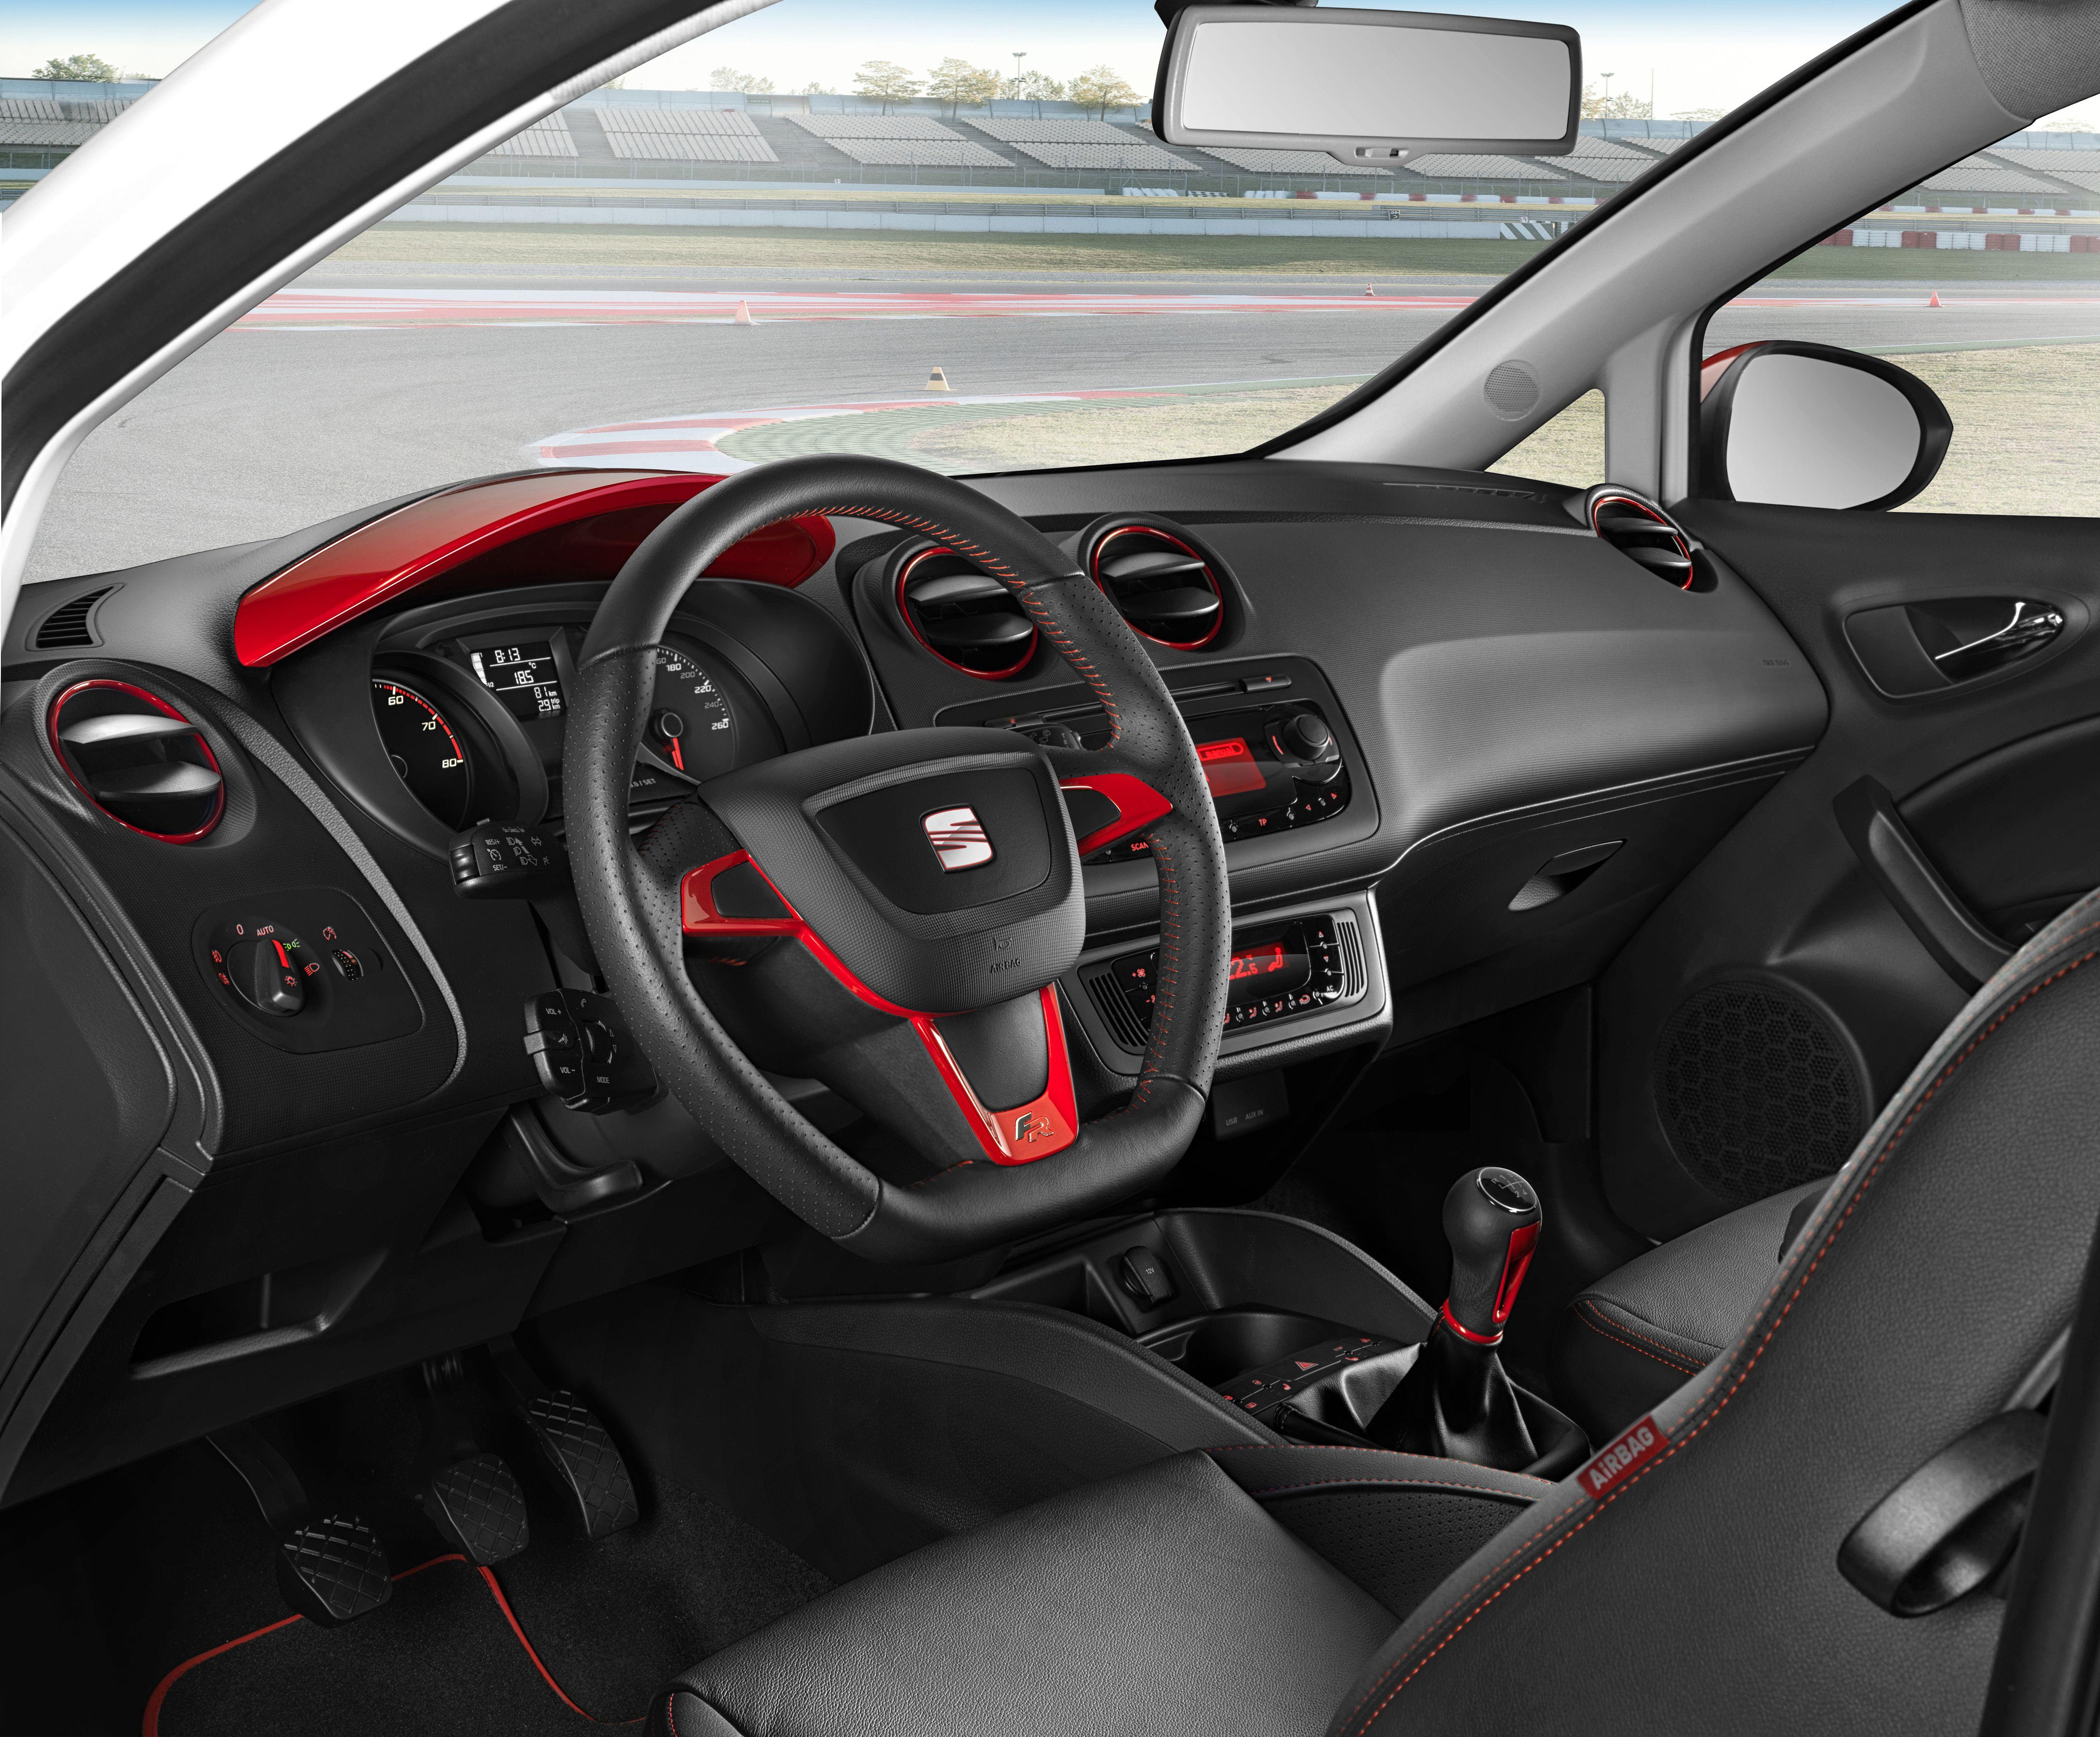 Seat ibiza fr seat pinterest voitures for Seat ibiza innenraum